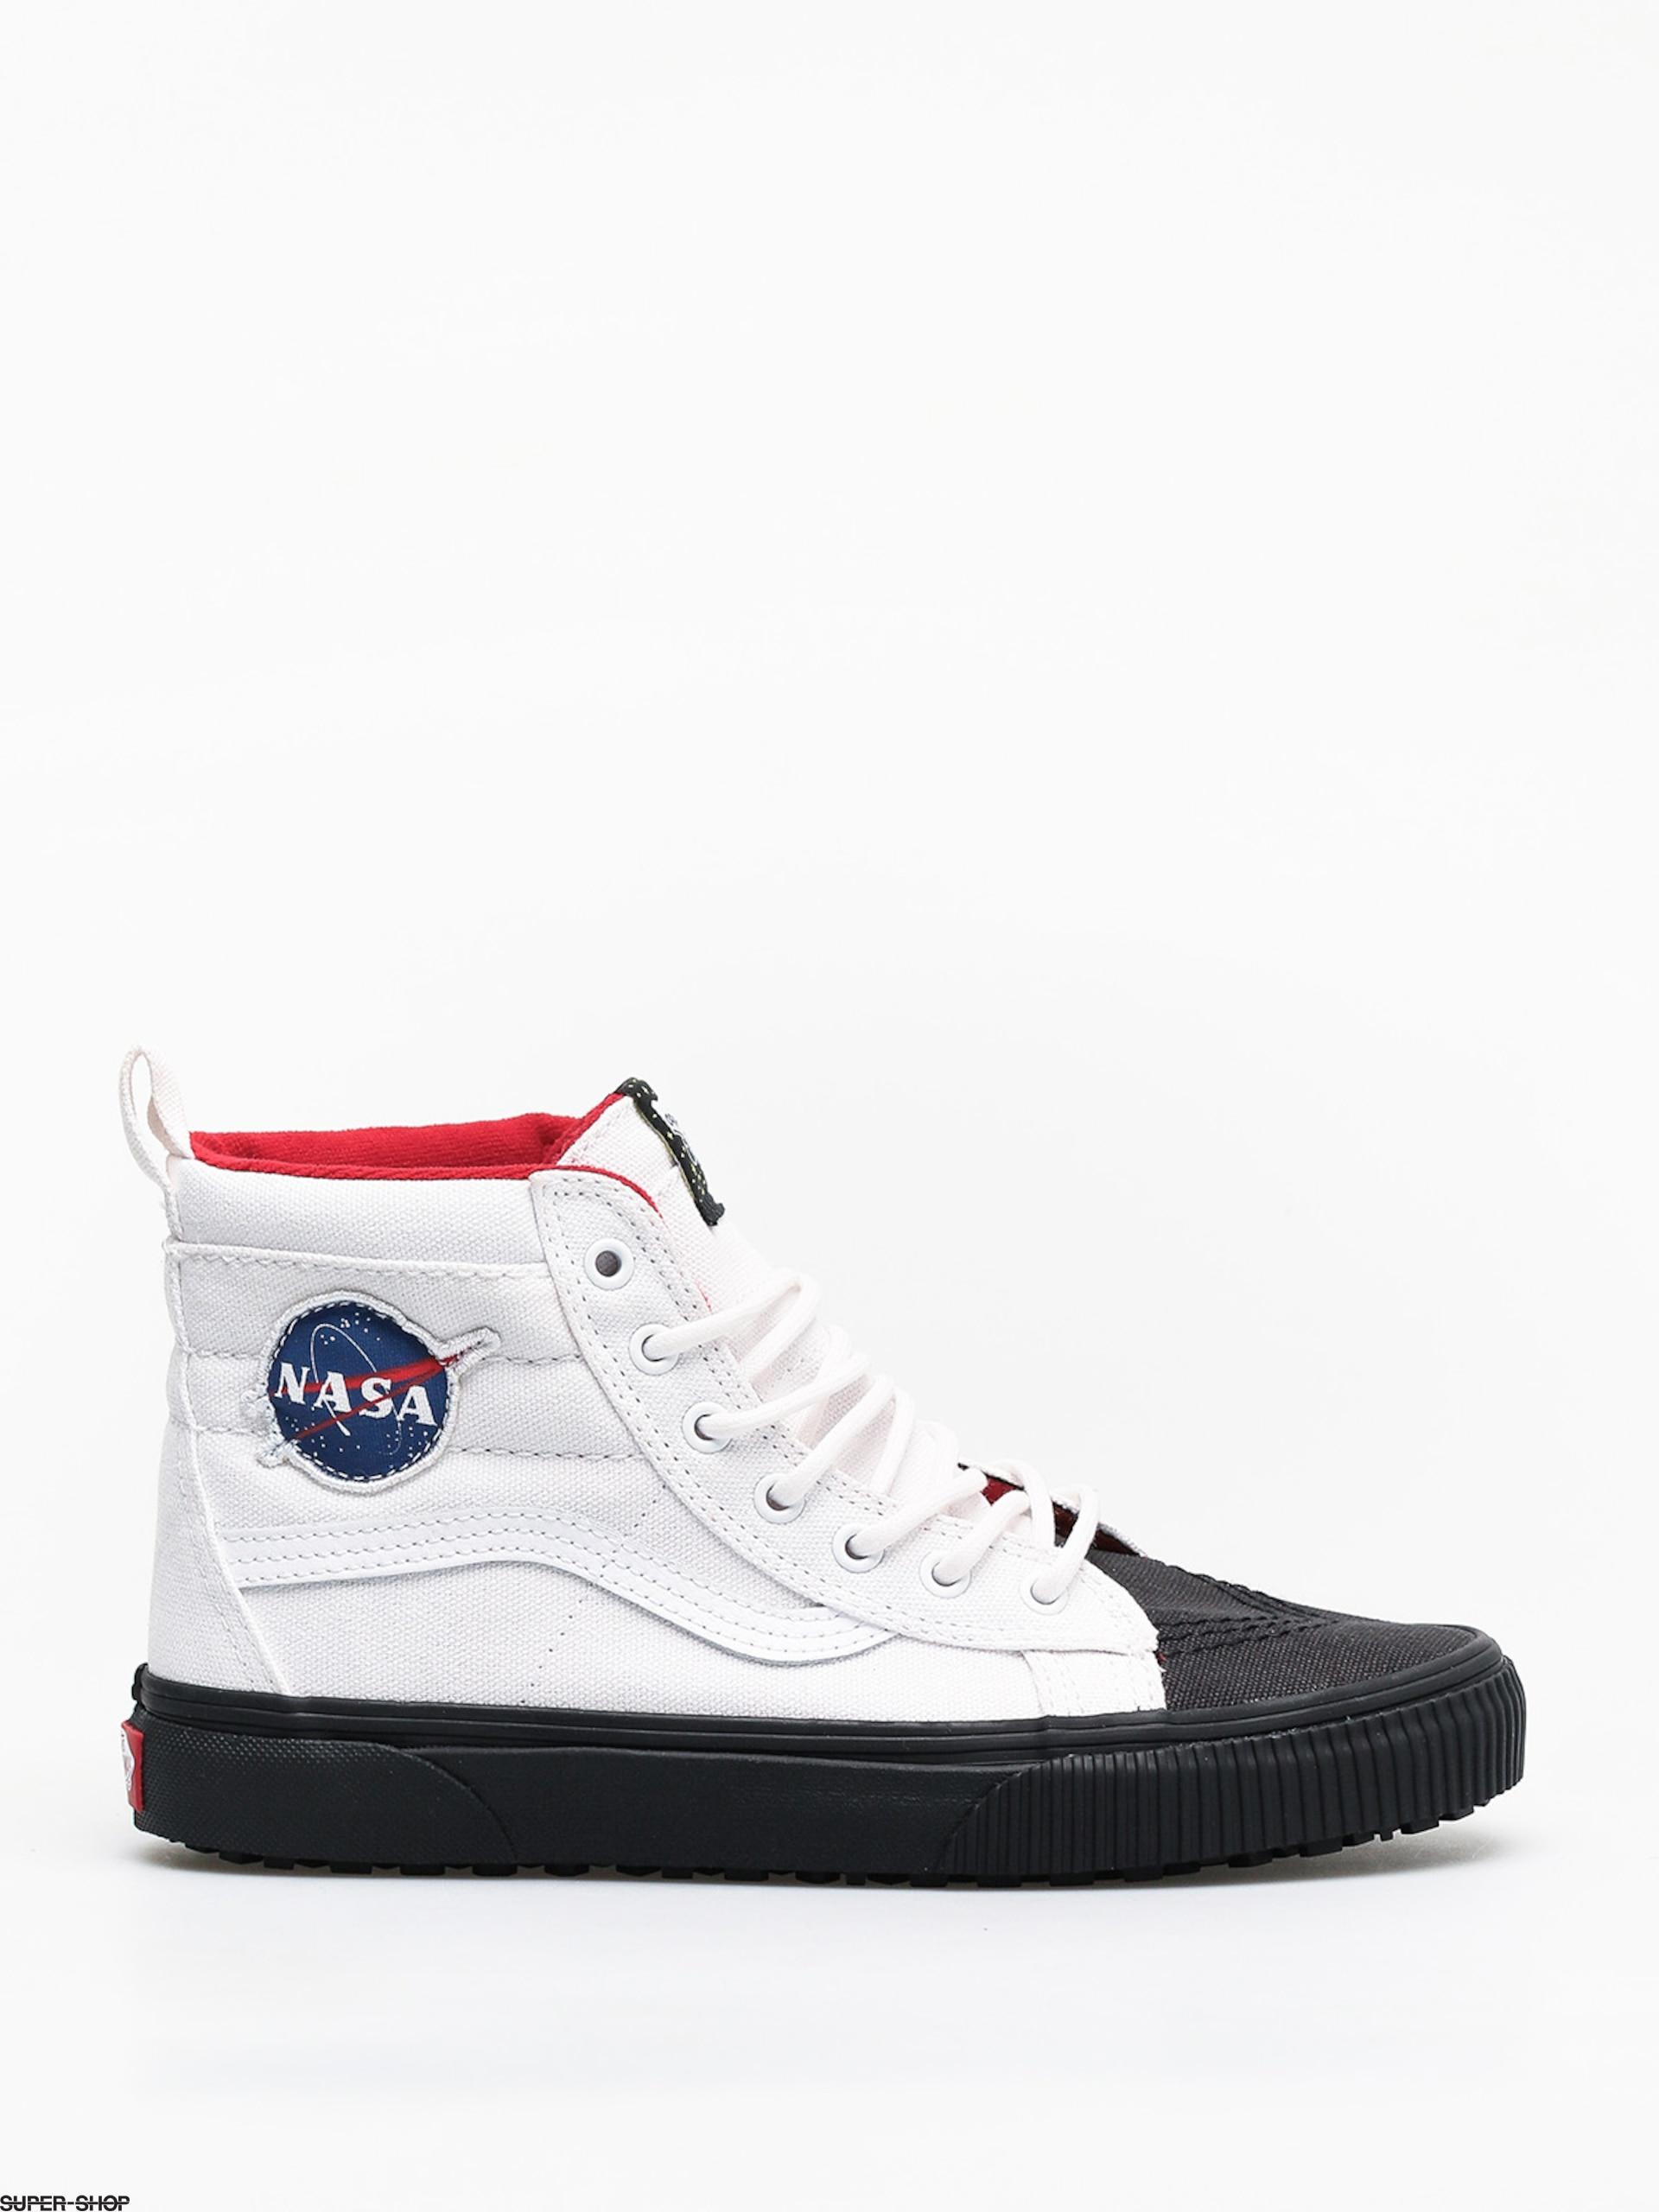 Vans Sk8 Hi Mte Space Voyager Shoes